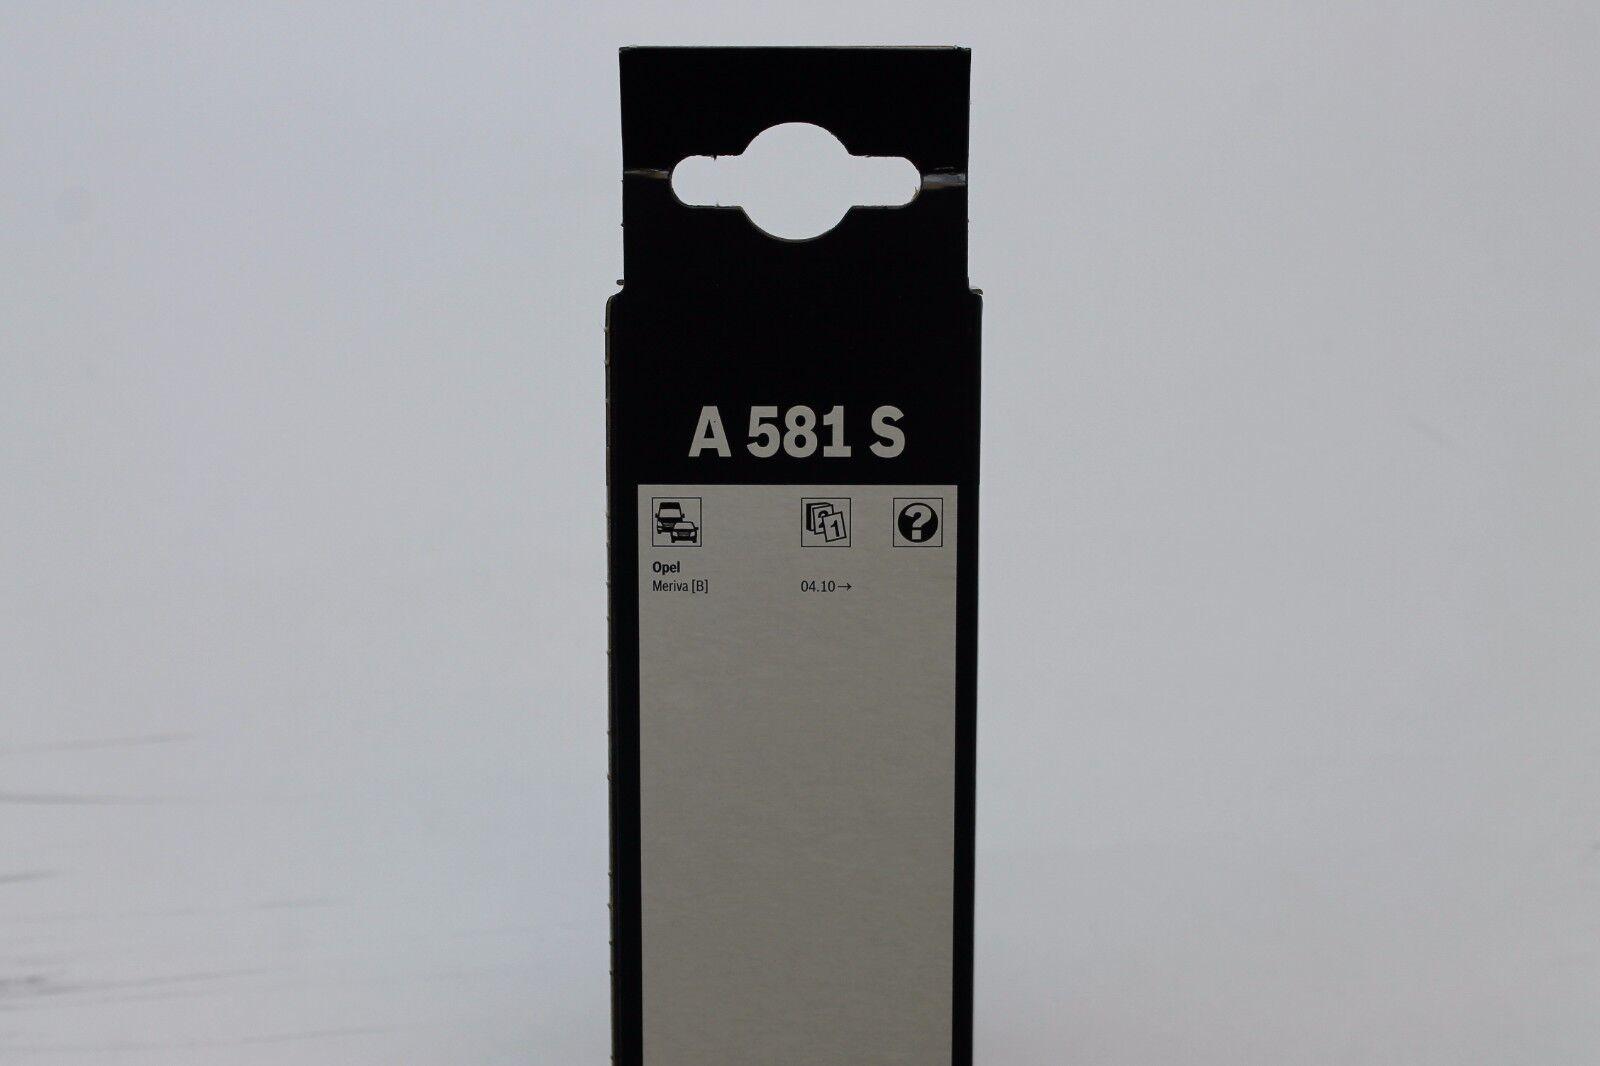 bosch aerotwin a581s 680 575 mm wischerbl tter satz f r. Black Bedroom Furniture Sets. Home Design Ideas